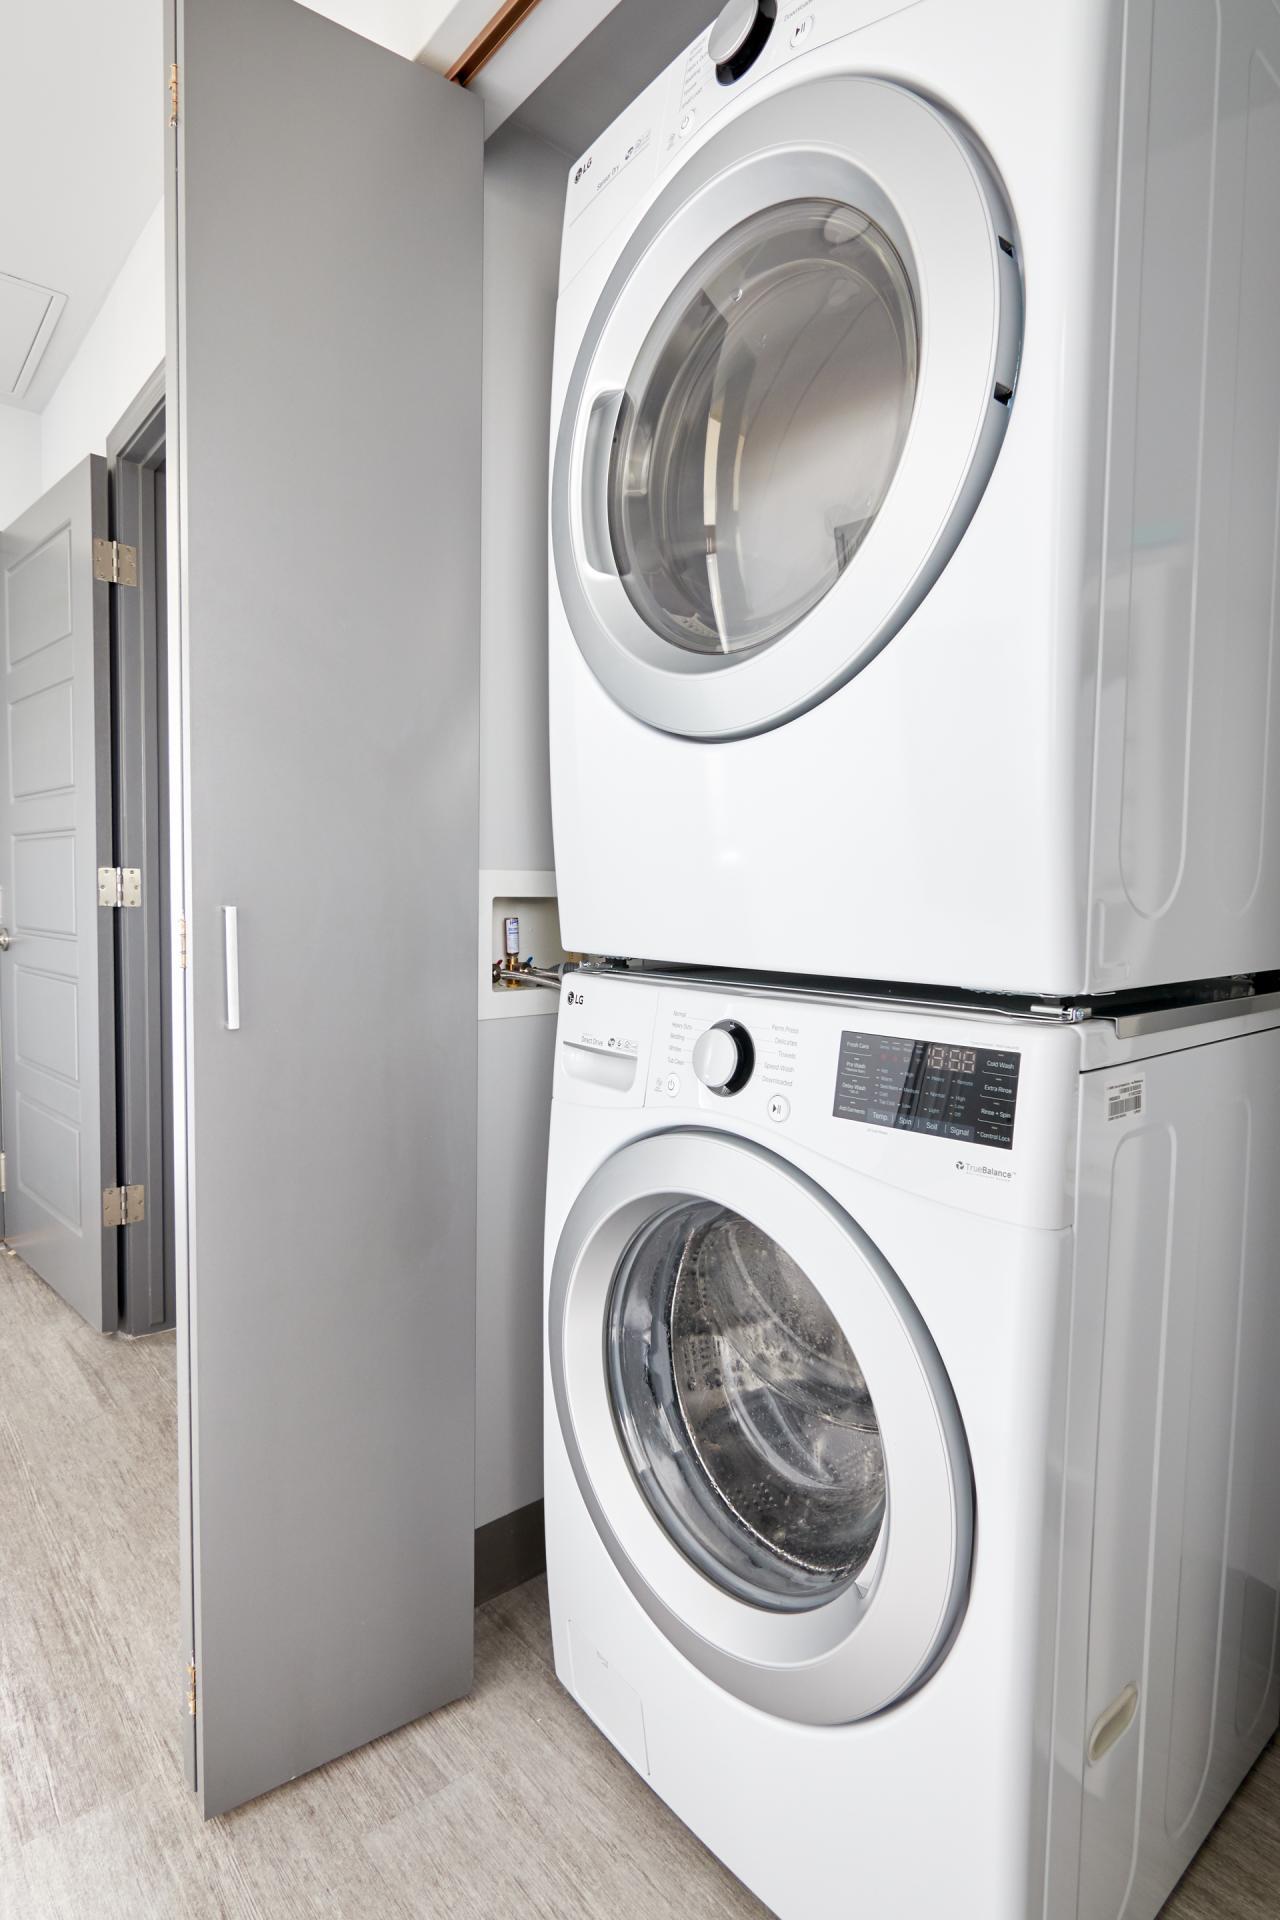 Laundry at McKinley Apartments, Center, Phoenix